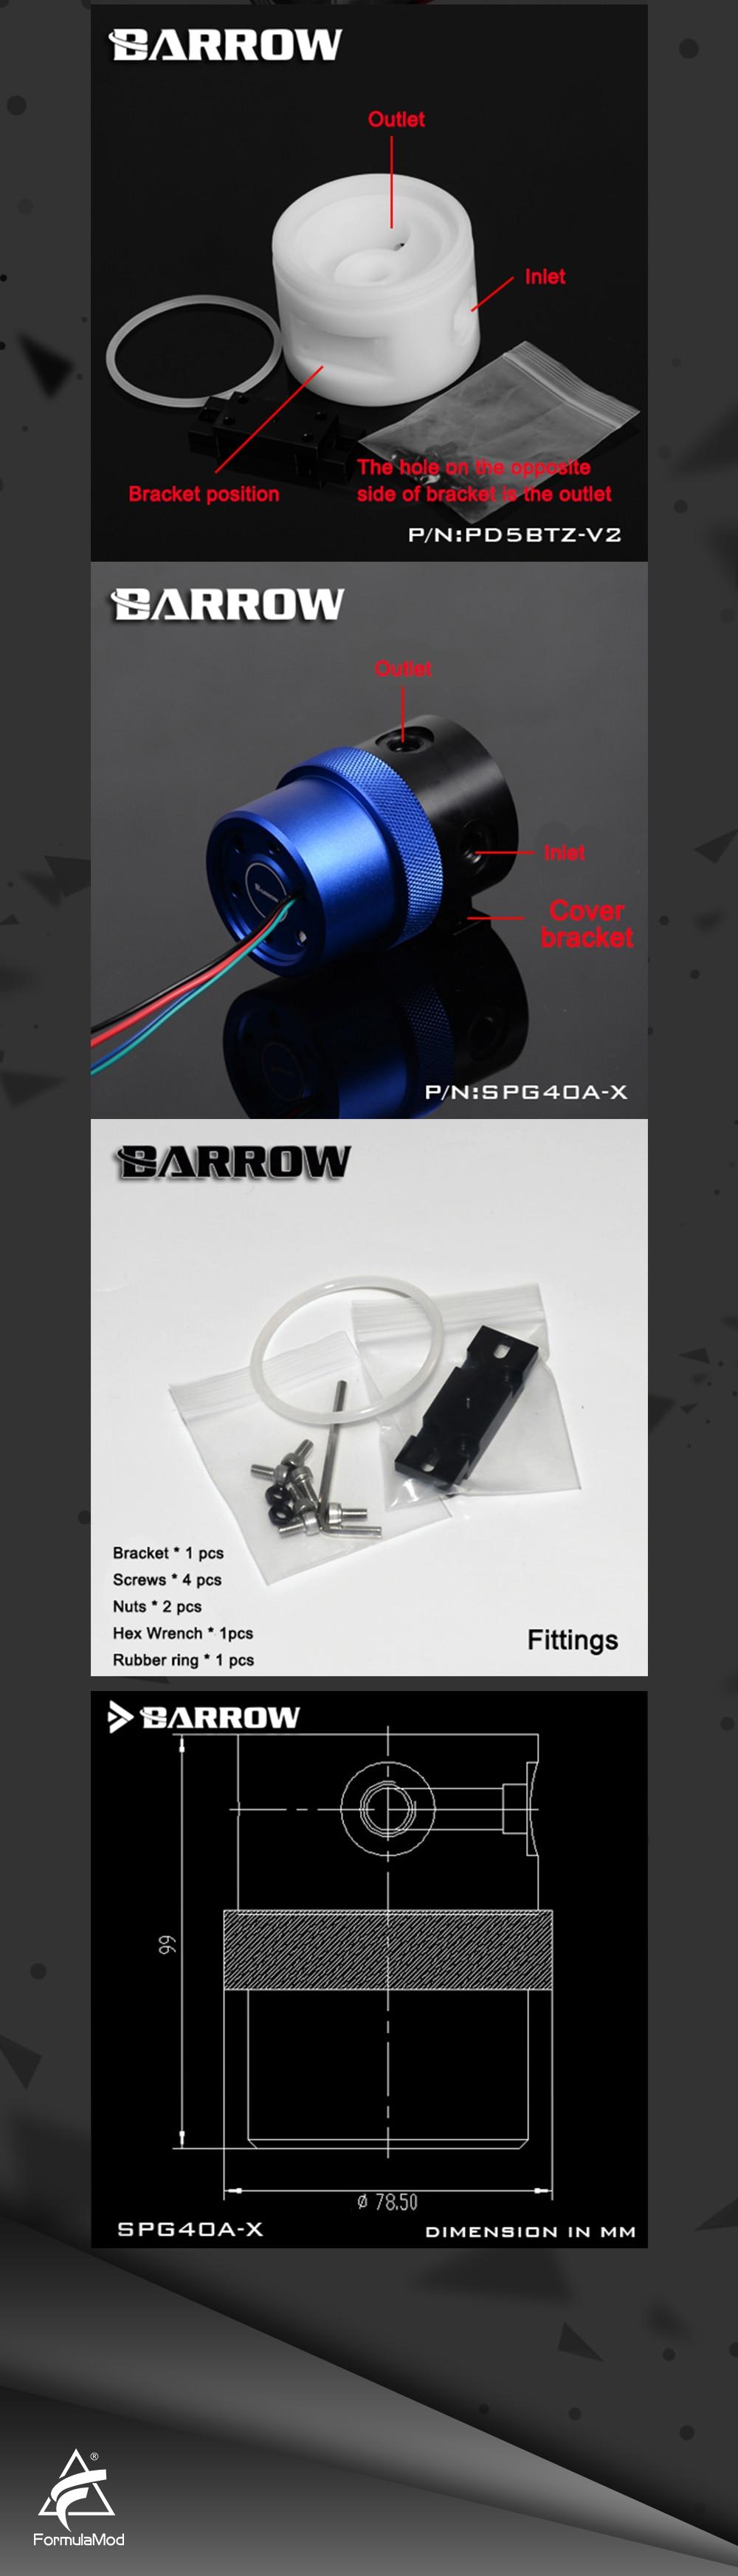 Barrow SPG40A-X, 18W PWM Pumps, Maximum Flow 1260L/H, Compatible with D5 Series Pump Cores and Components